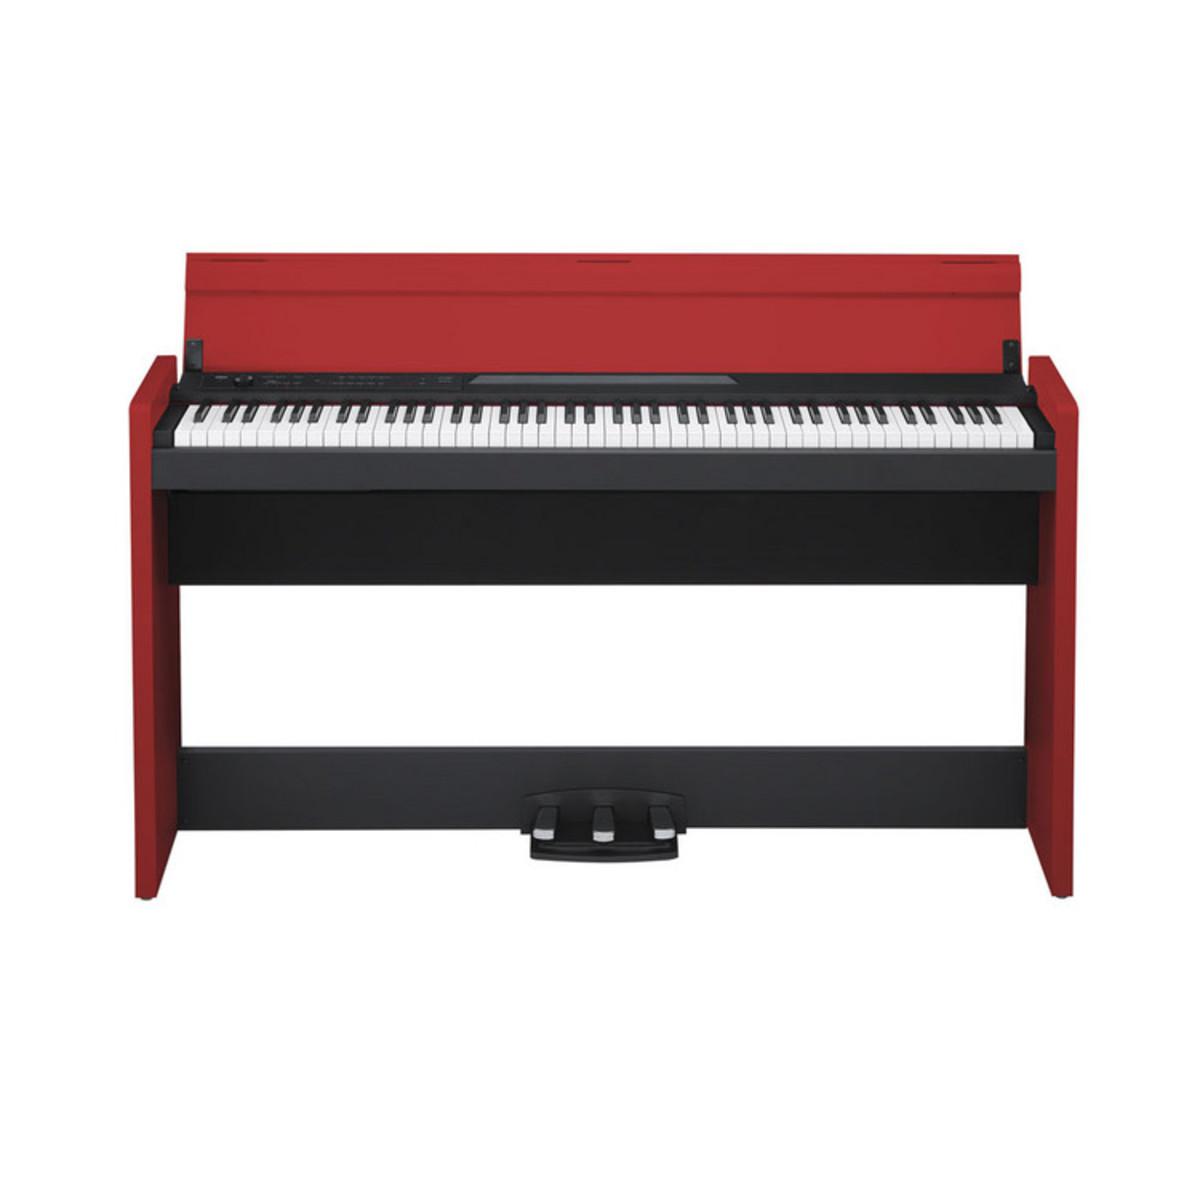 disc korg lp 380 digital piano black and red at gear4music. Black Bedroom Furniture Sets. Home Design Ideas